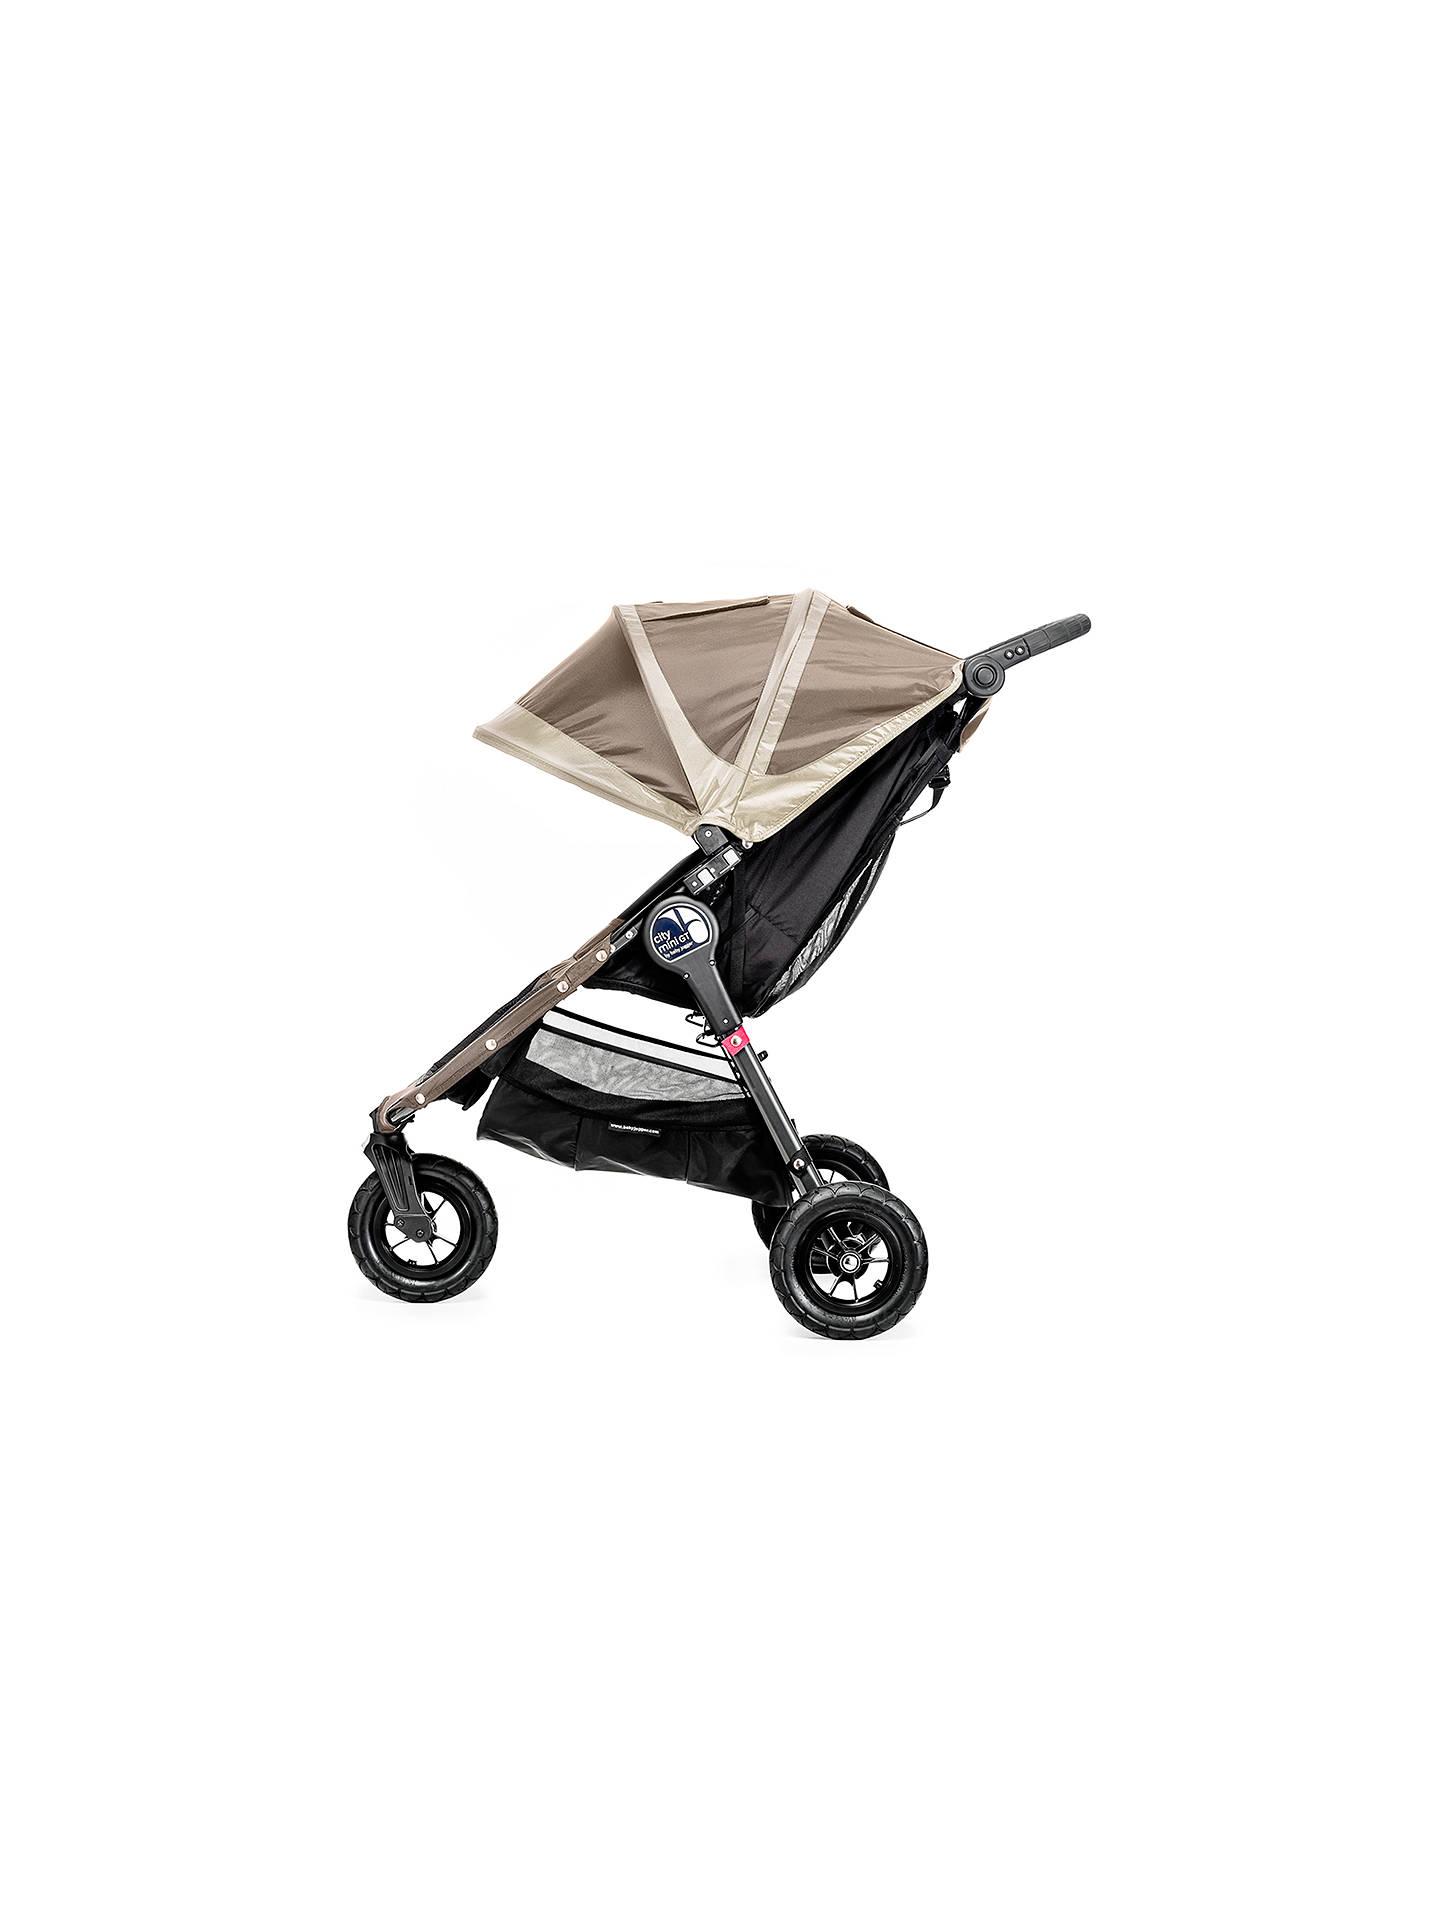 Baby Jogger City Mini GT Pushchair, Sand/Stone at John Lewis